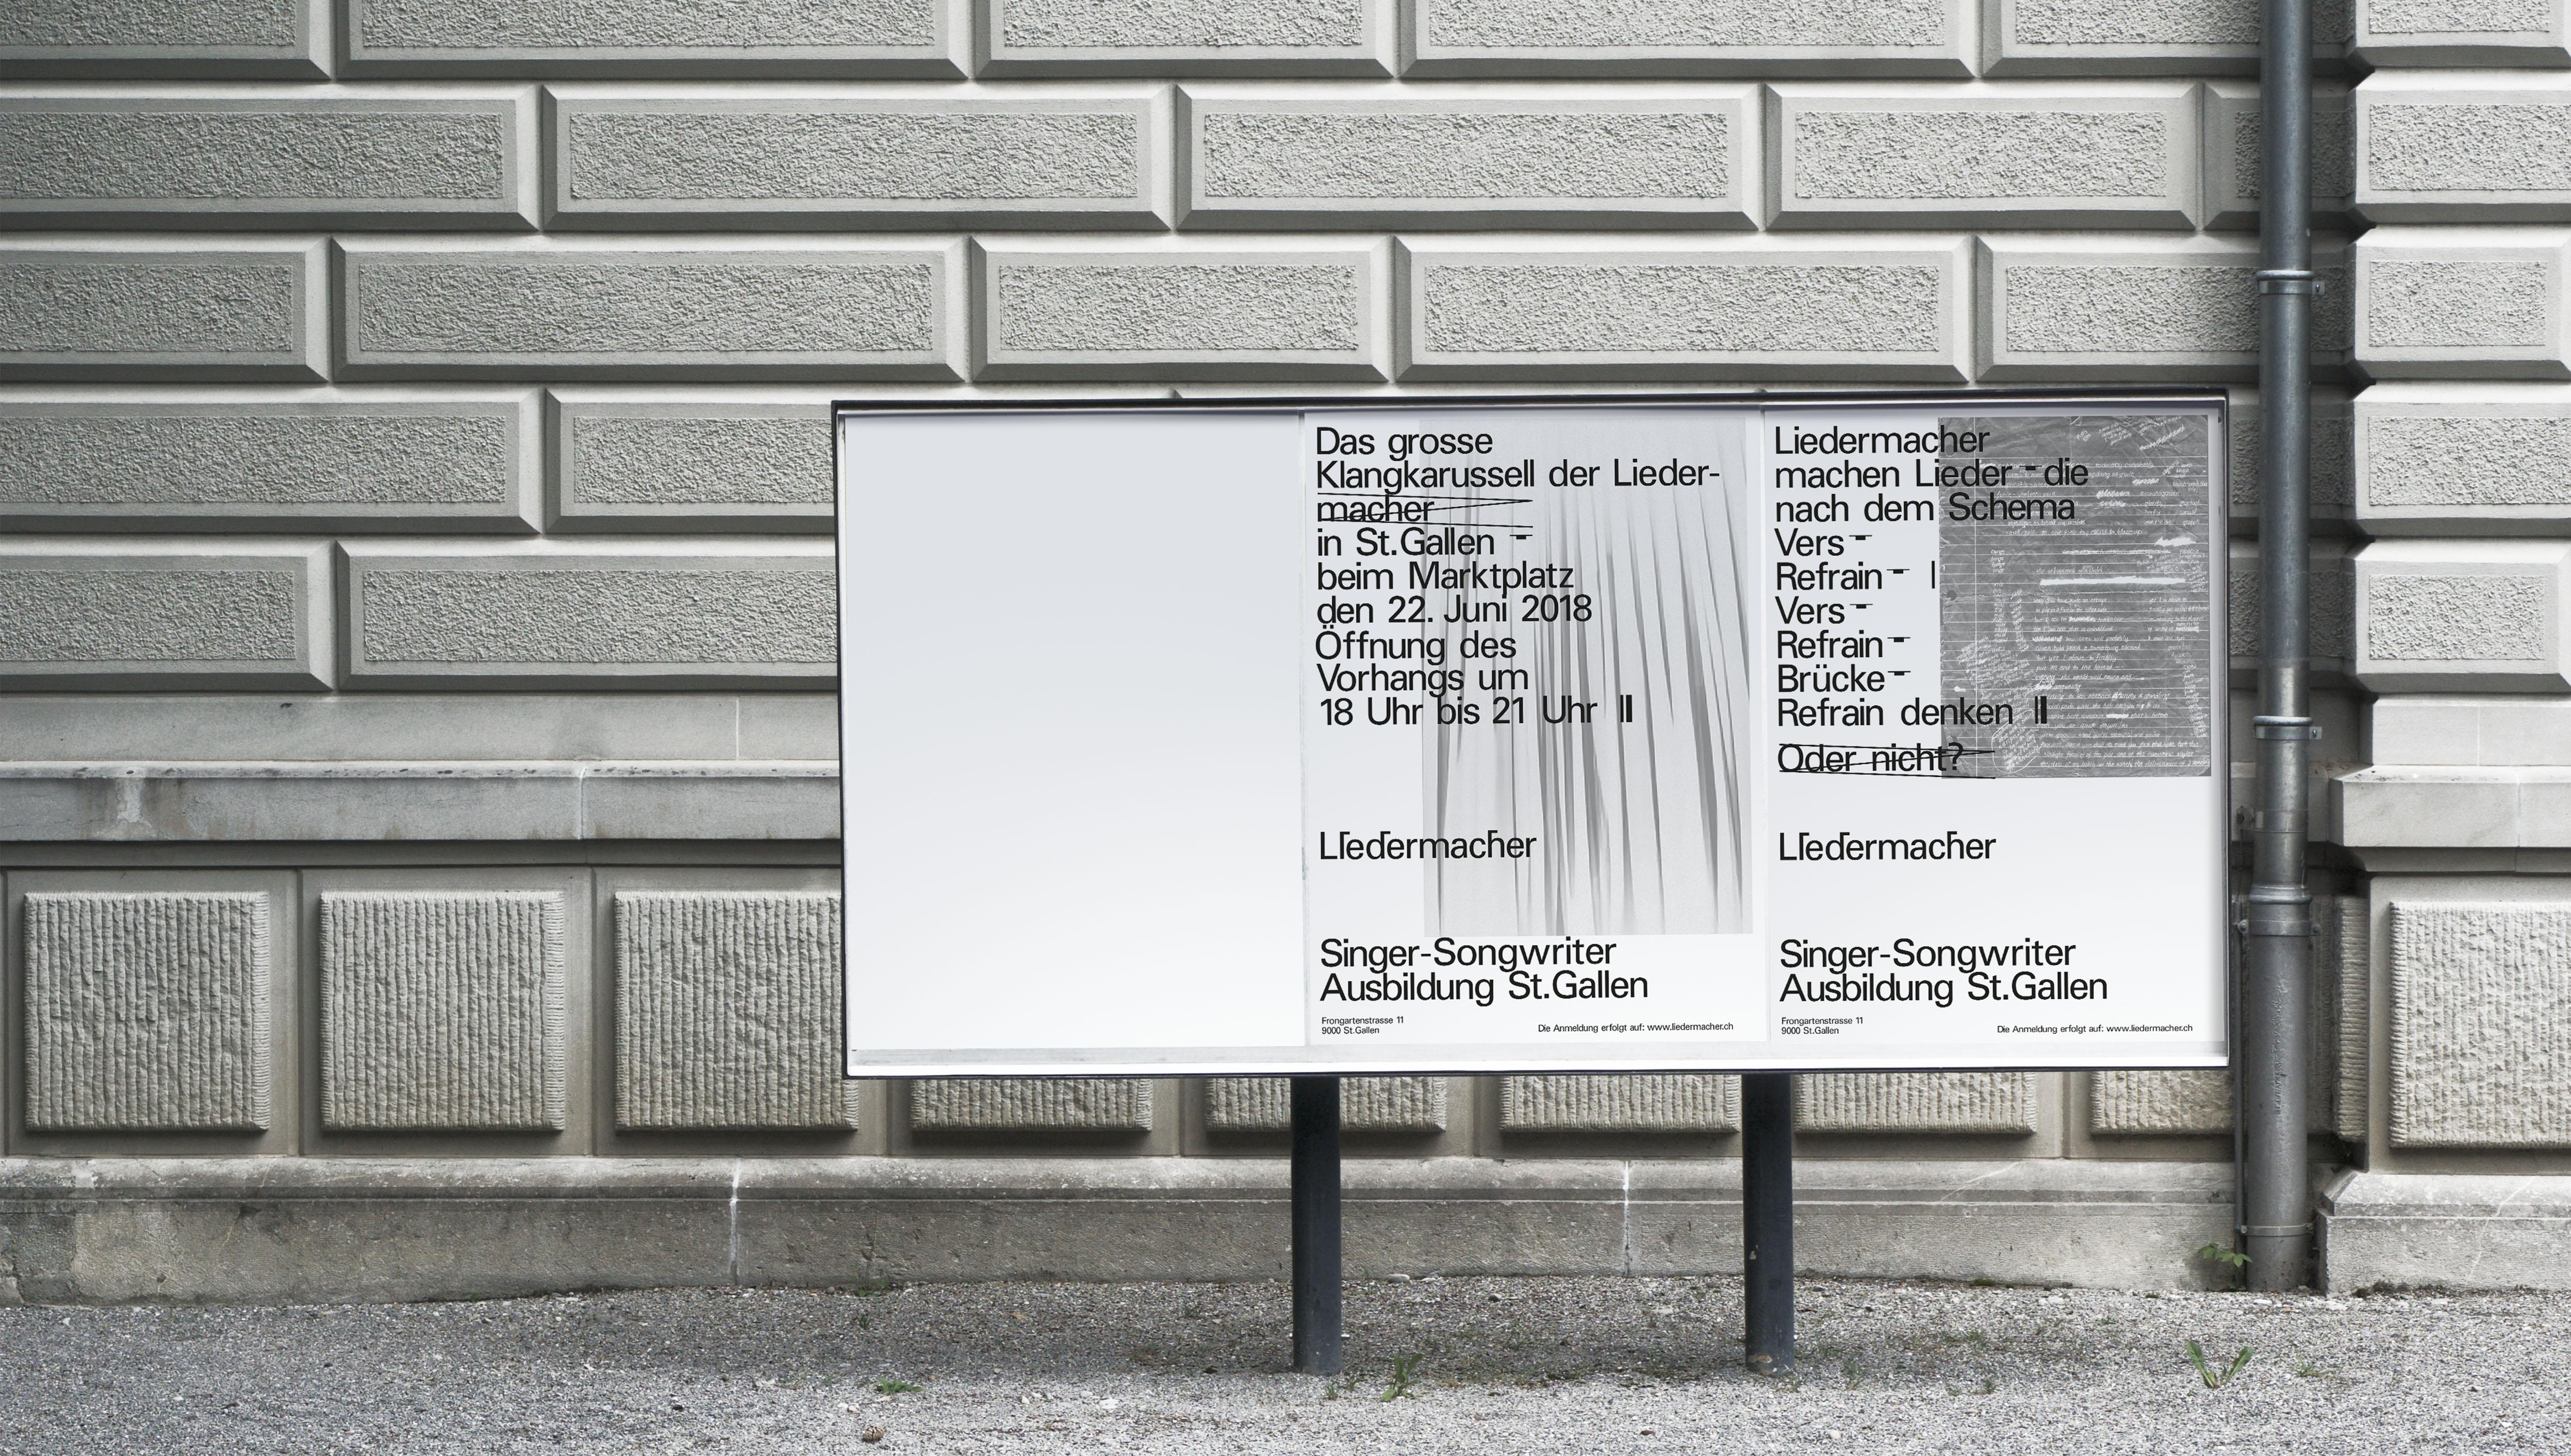 Liedermacher_armanda-asani.ch_Plakate_